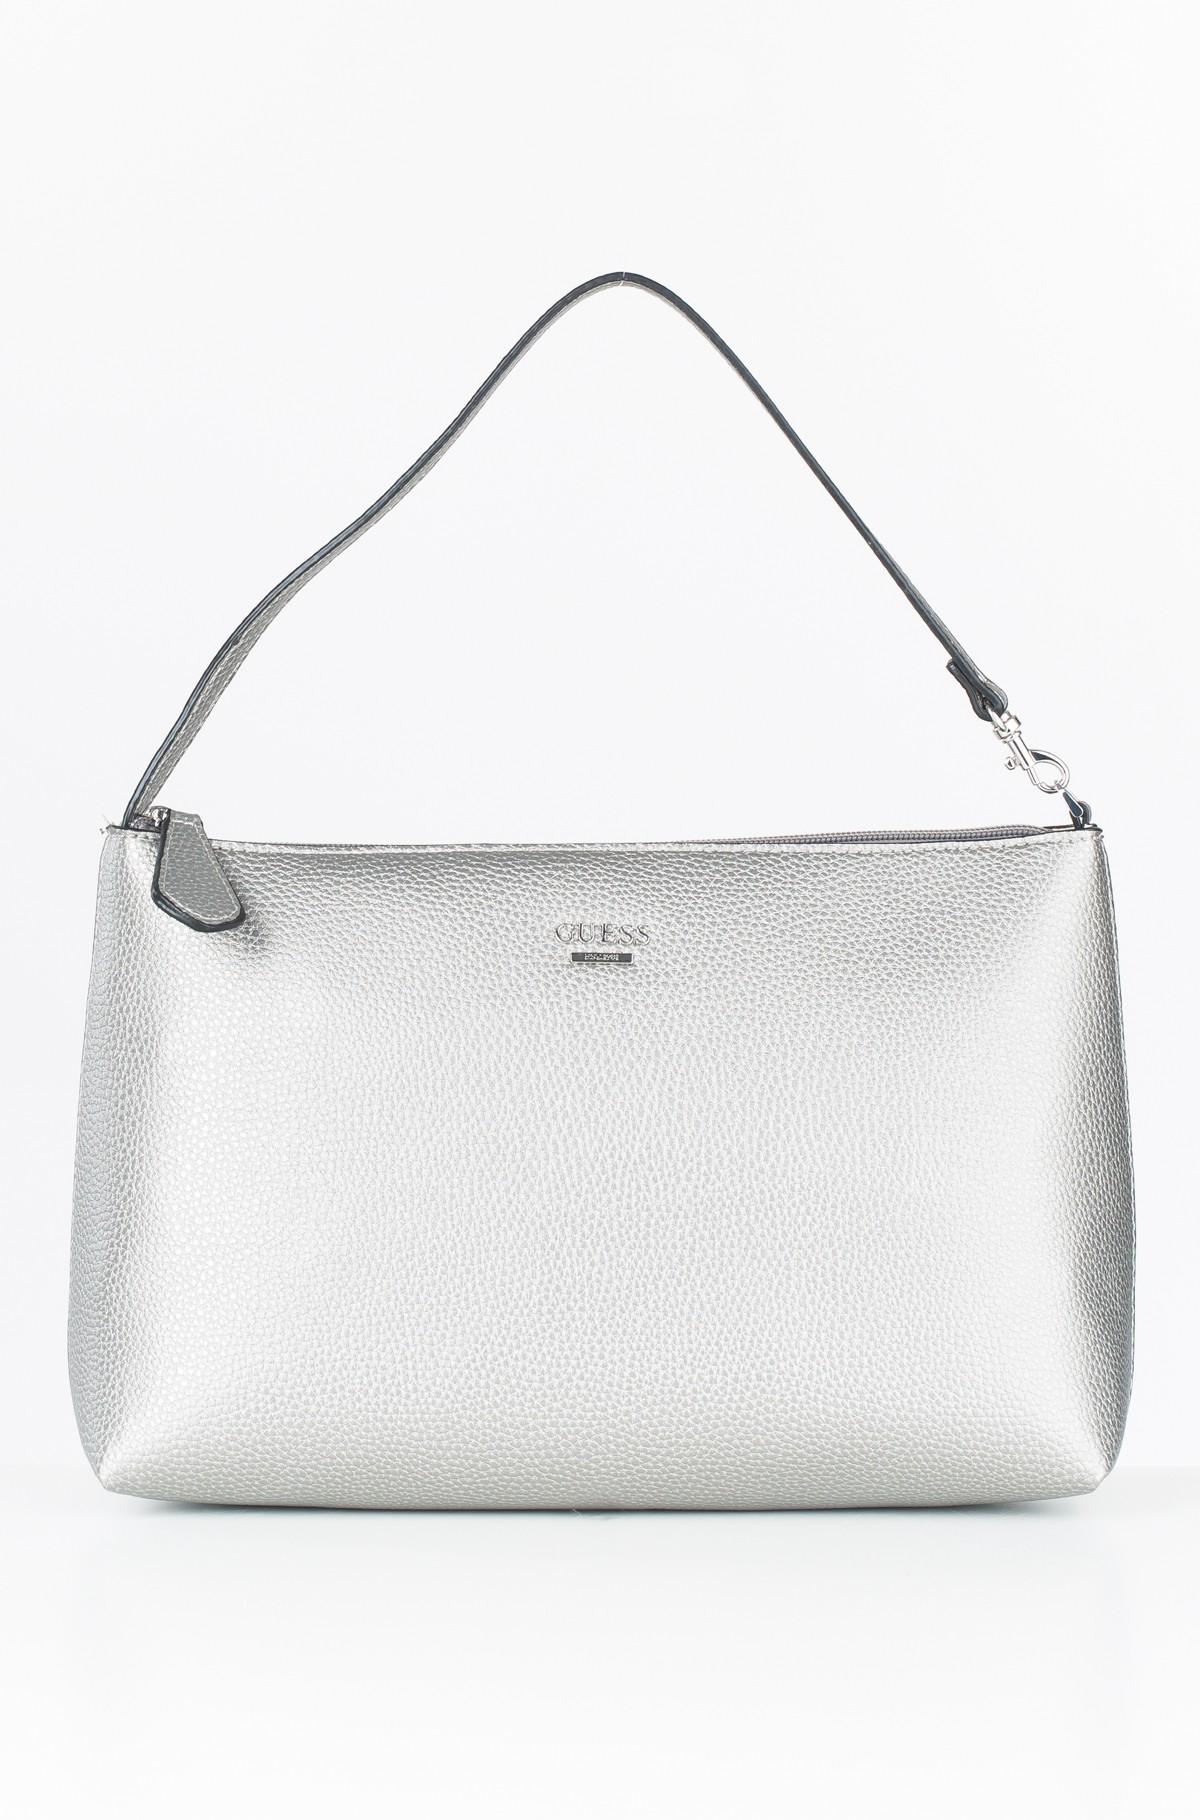 Handbag HWAC64 22150-full-3